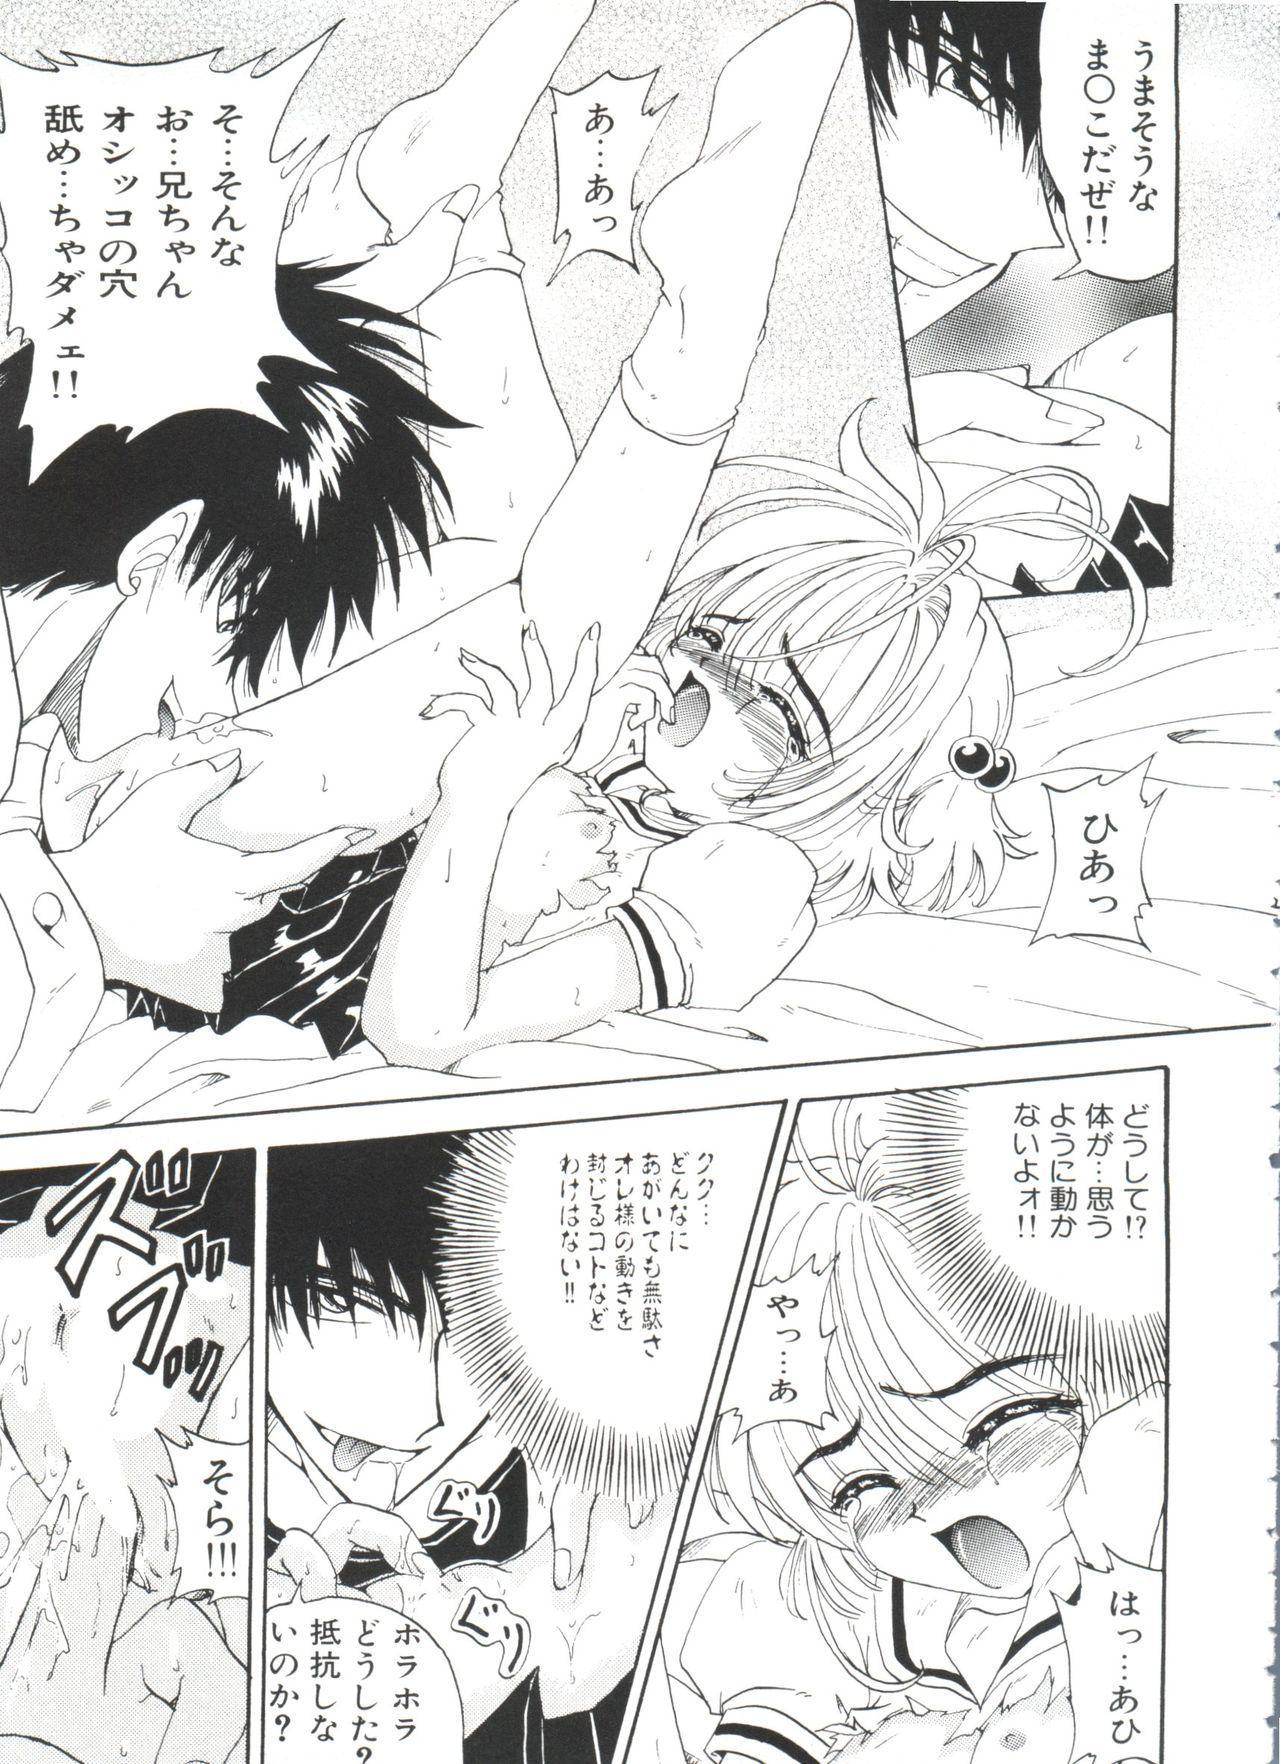 Ero-chan to Issho 2 108